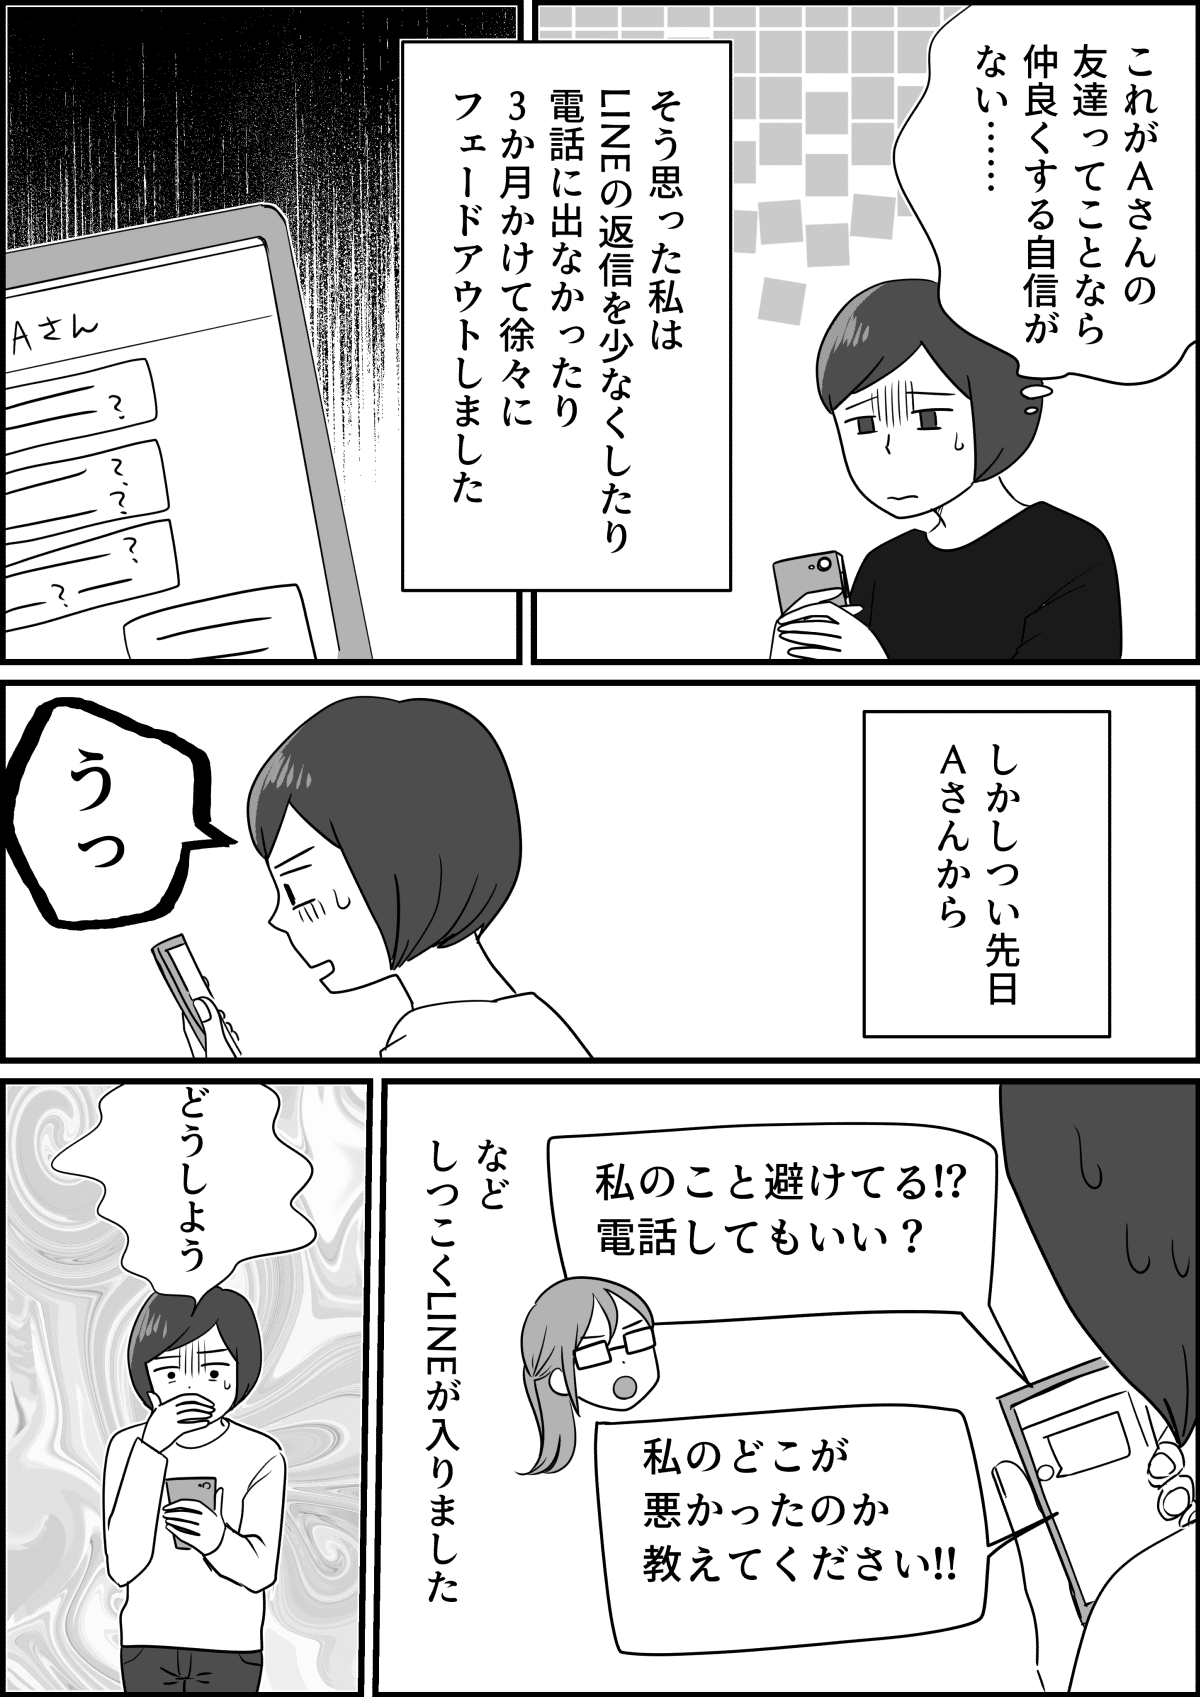 6_003